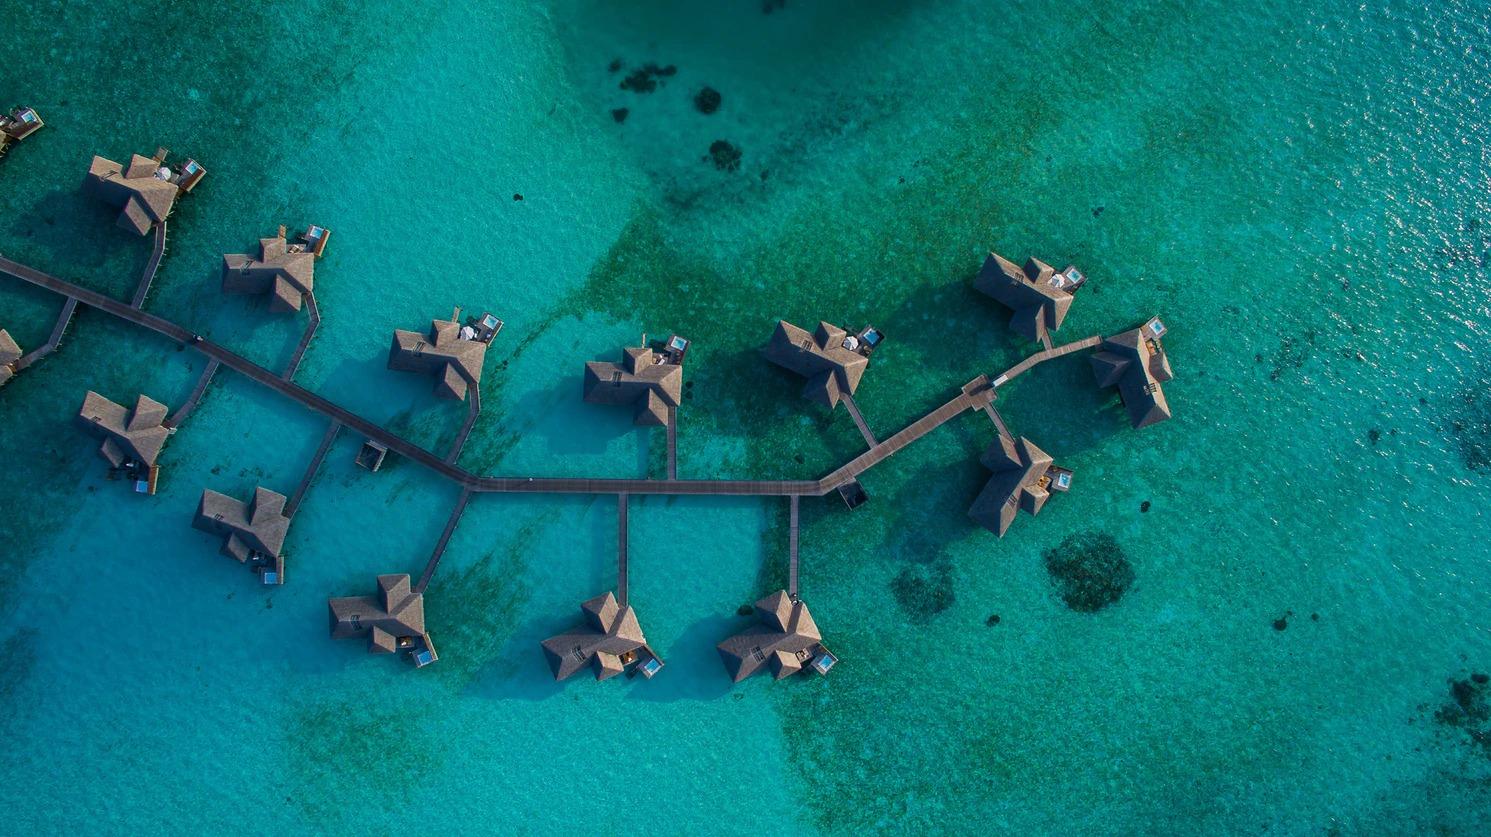 Mythbusters: 3 misverstanden rond eilandjescultuur